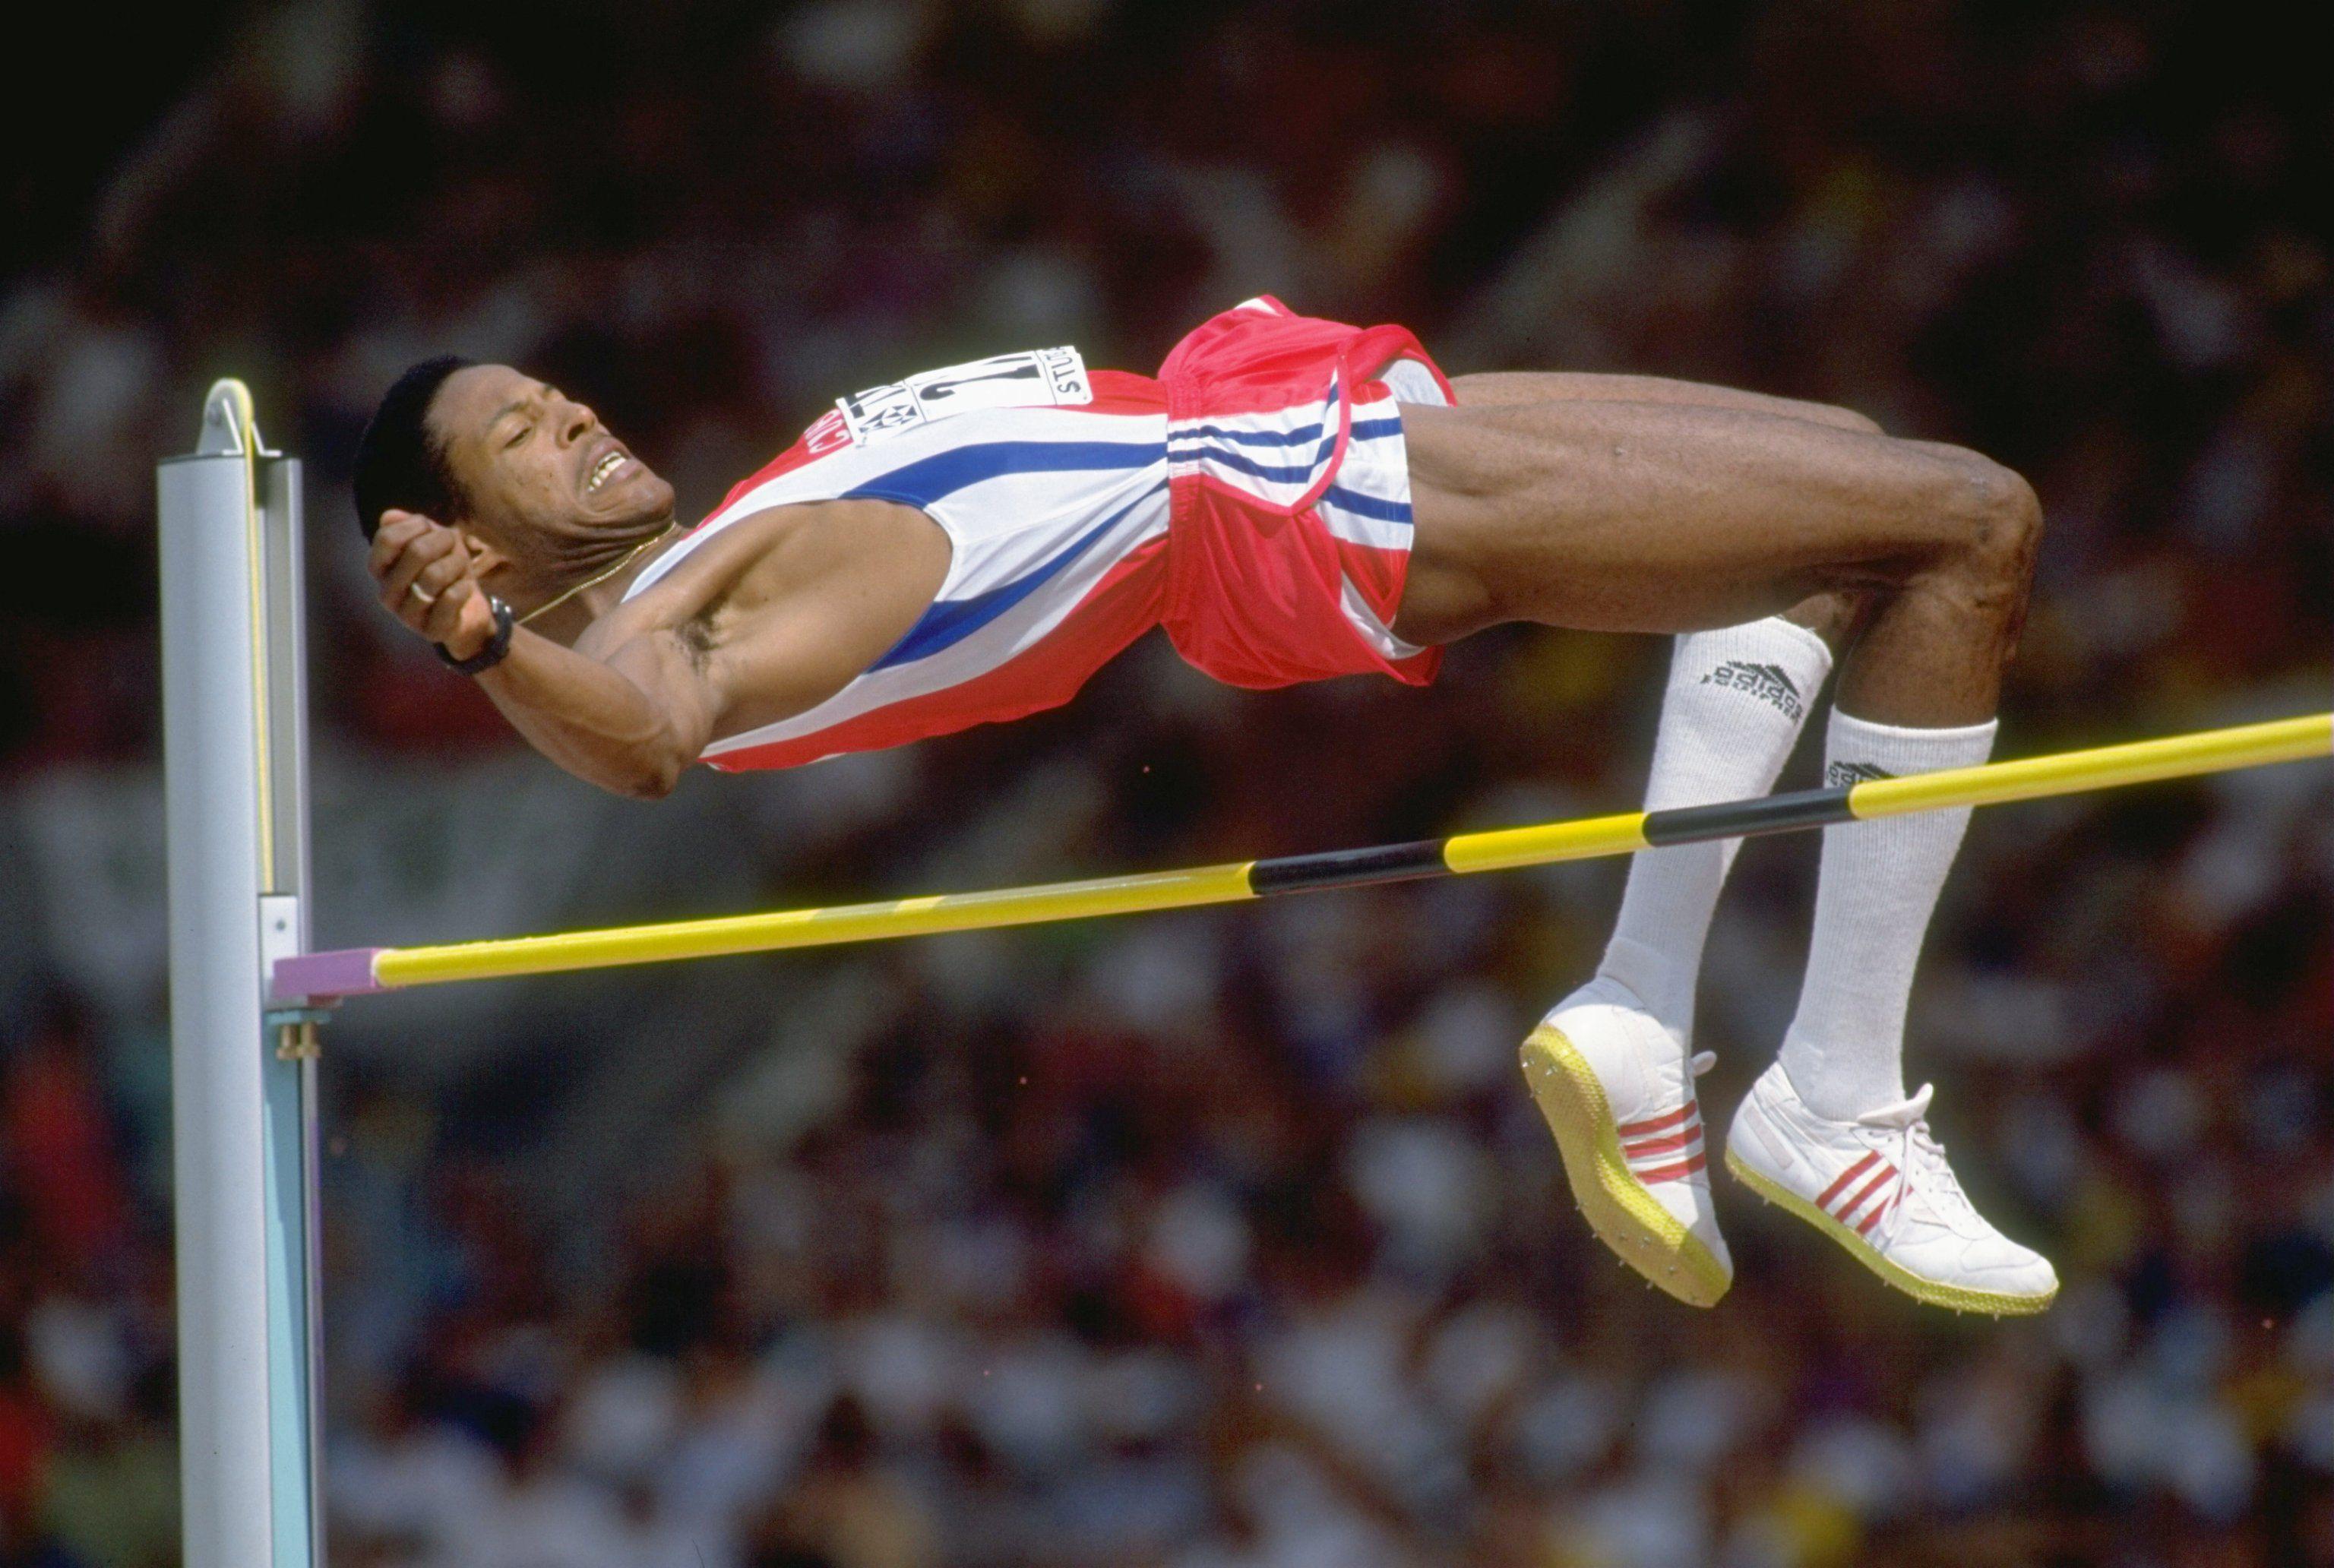 Men's High Jump World Records